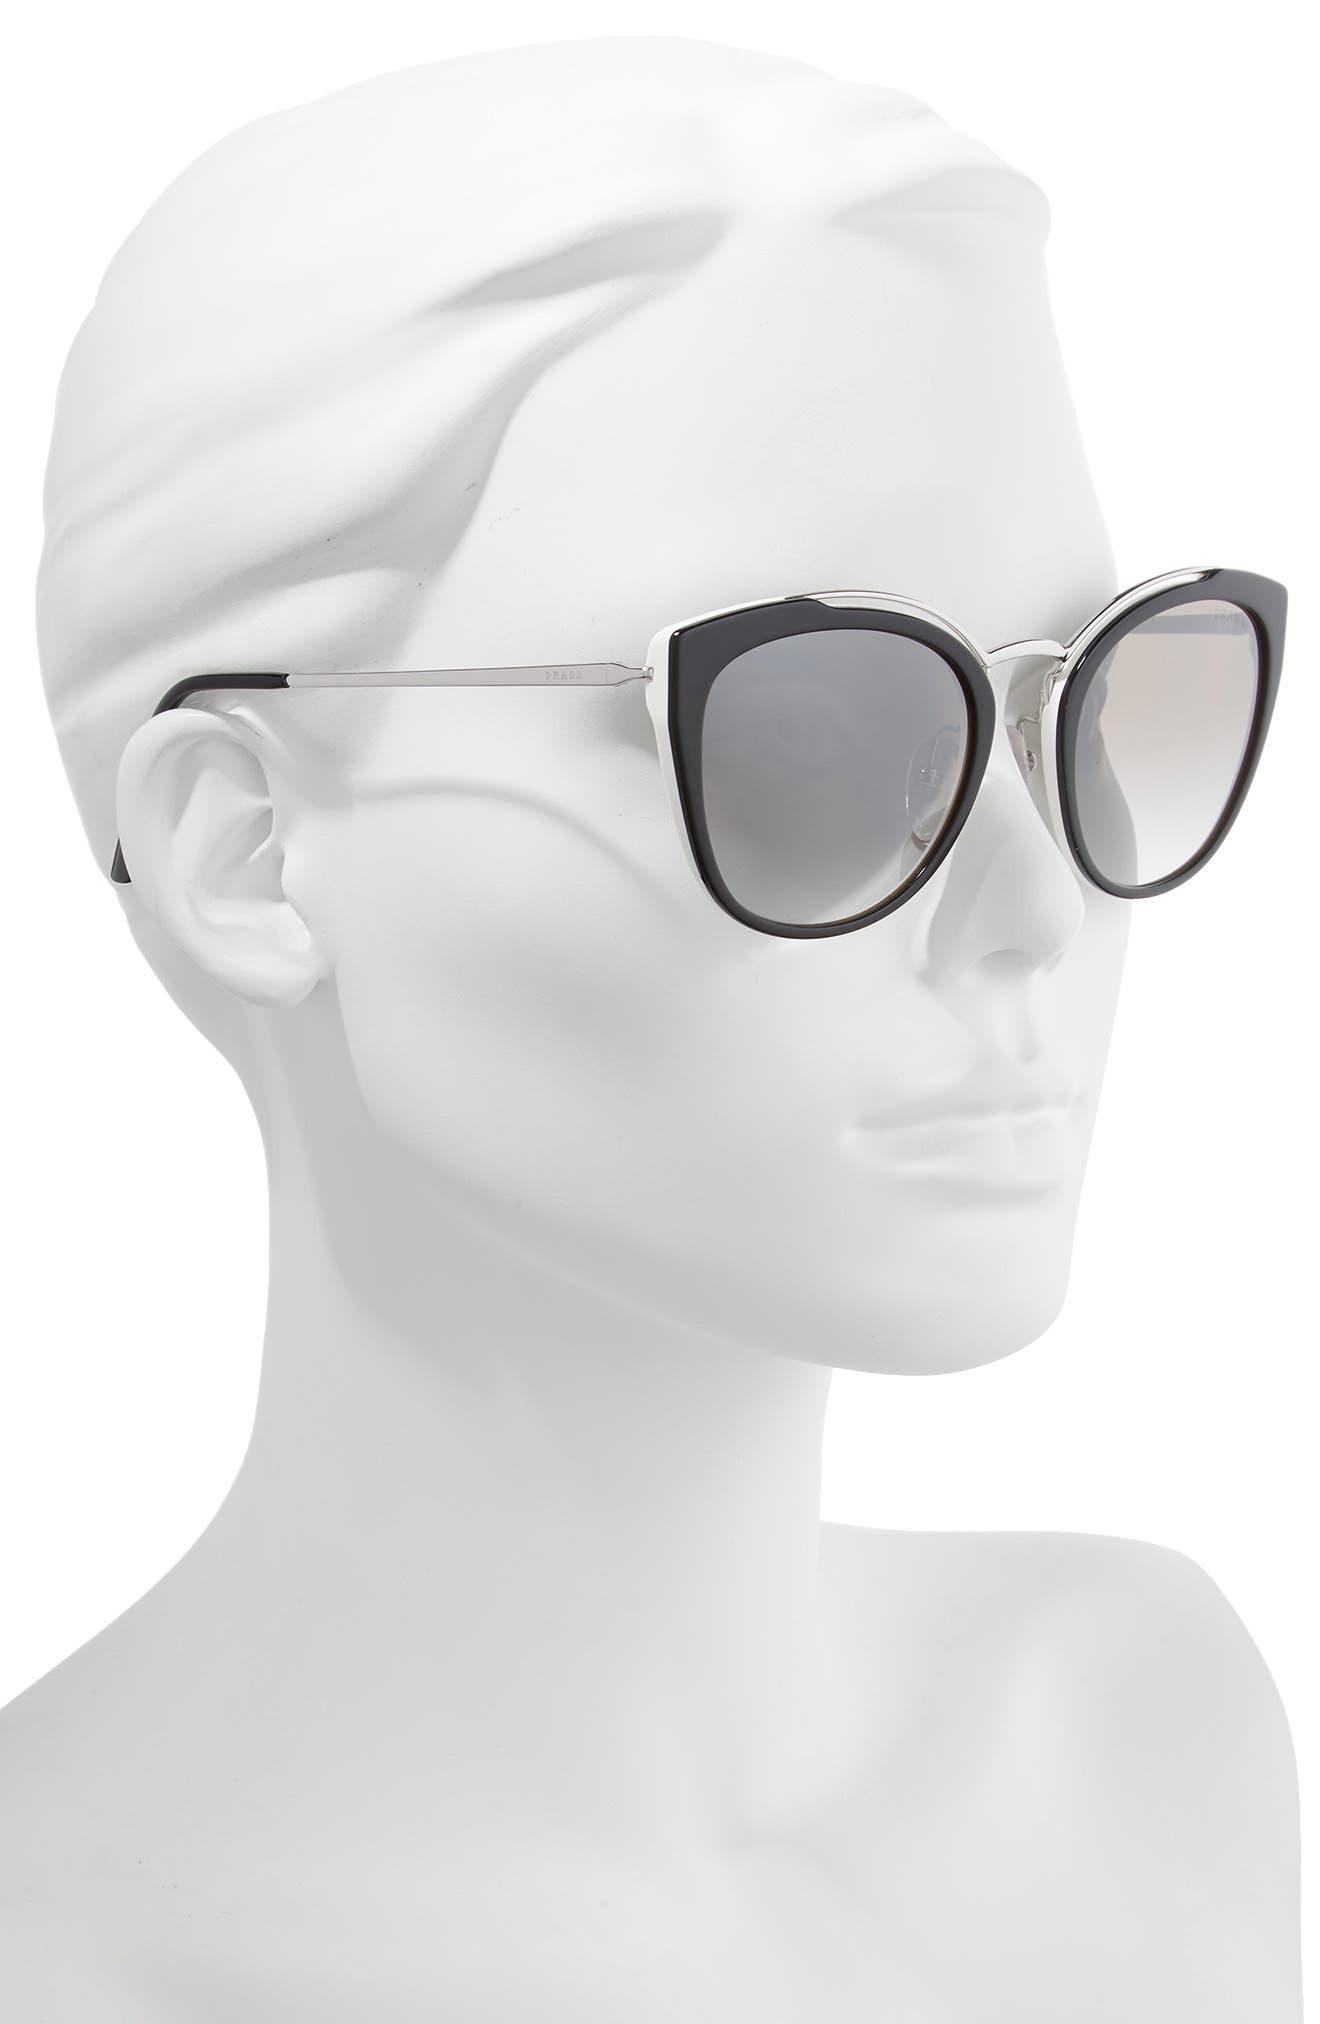 PRADA,                             54mm Gradient Cat Eye Sunglasses,                             Alternate thumbnail 2, color,                             BLACK/ SILVER GRADIENT MIRROR